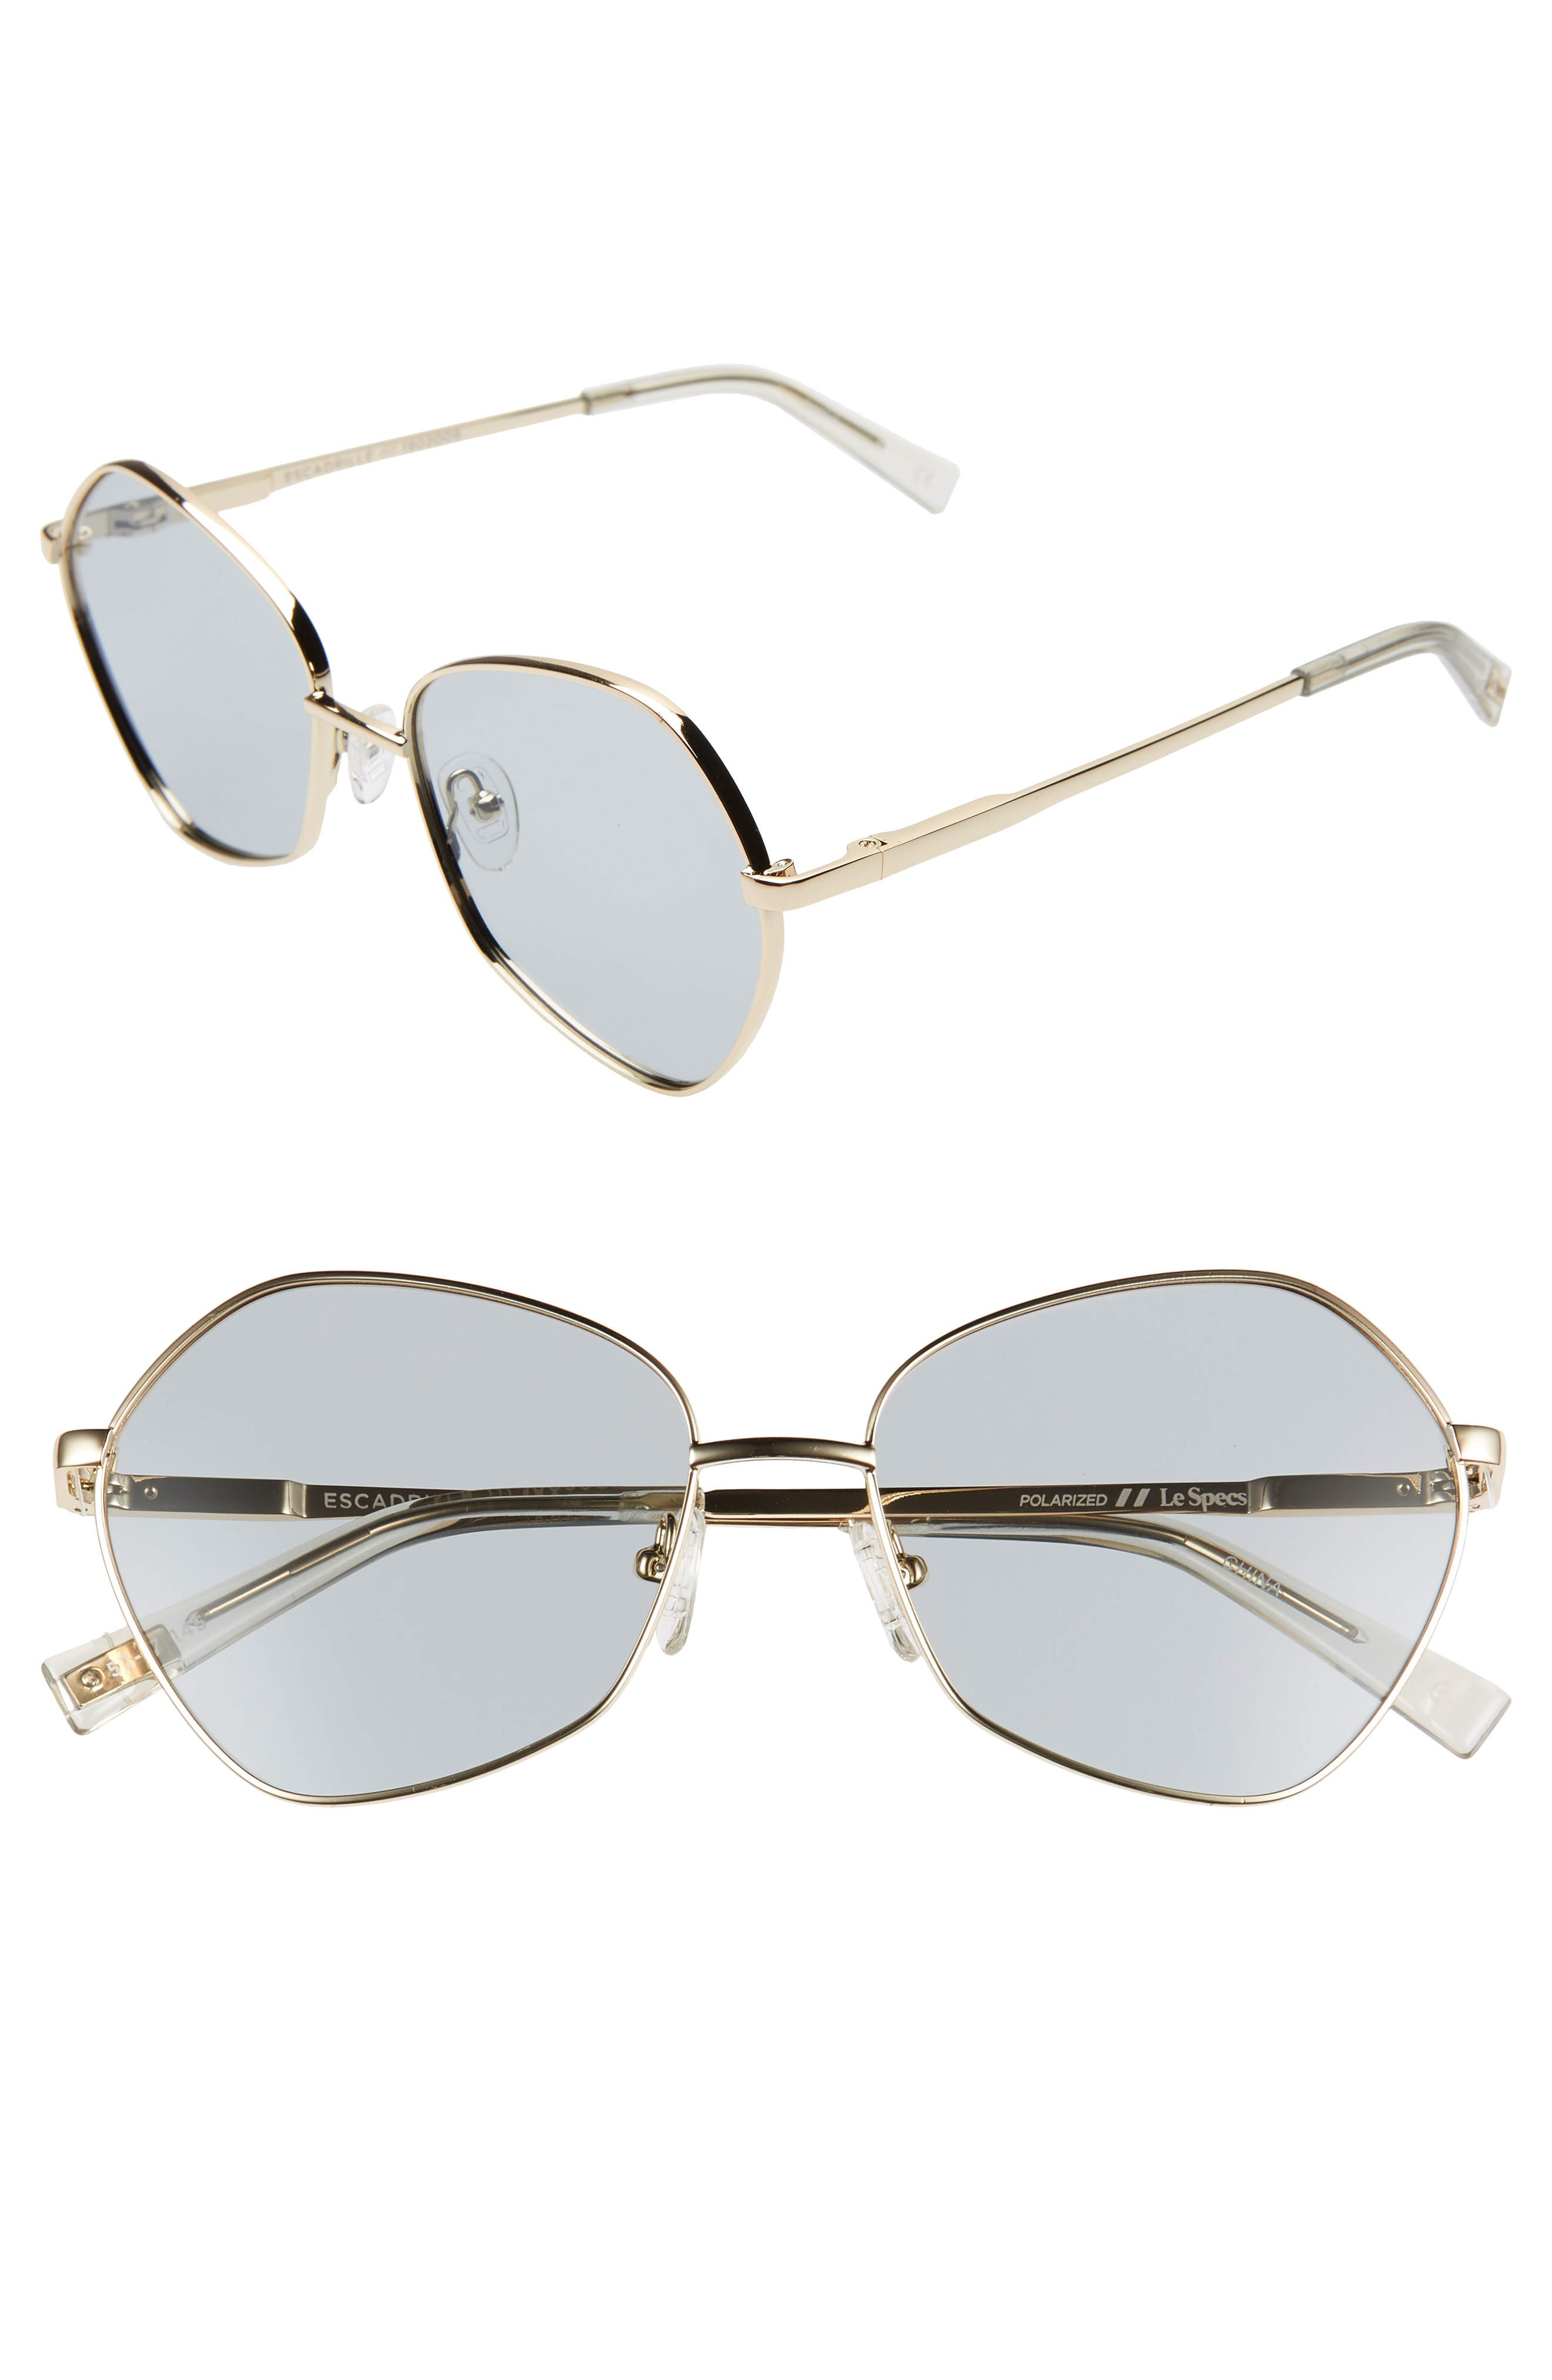 Le Specs Escadrille 57Mm Polarized Angular Sunglasses - Gold/ Grey Tint